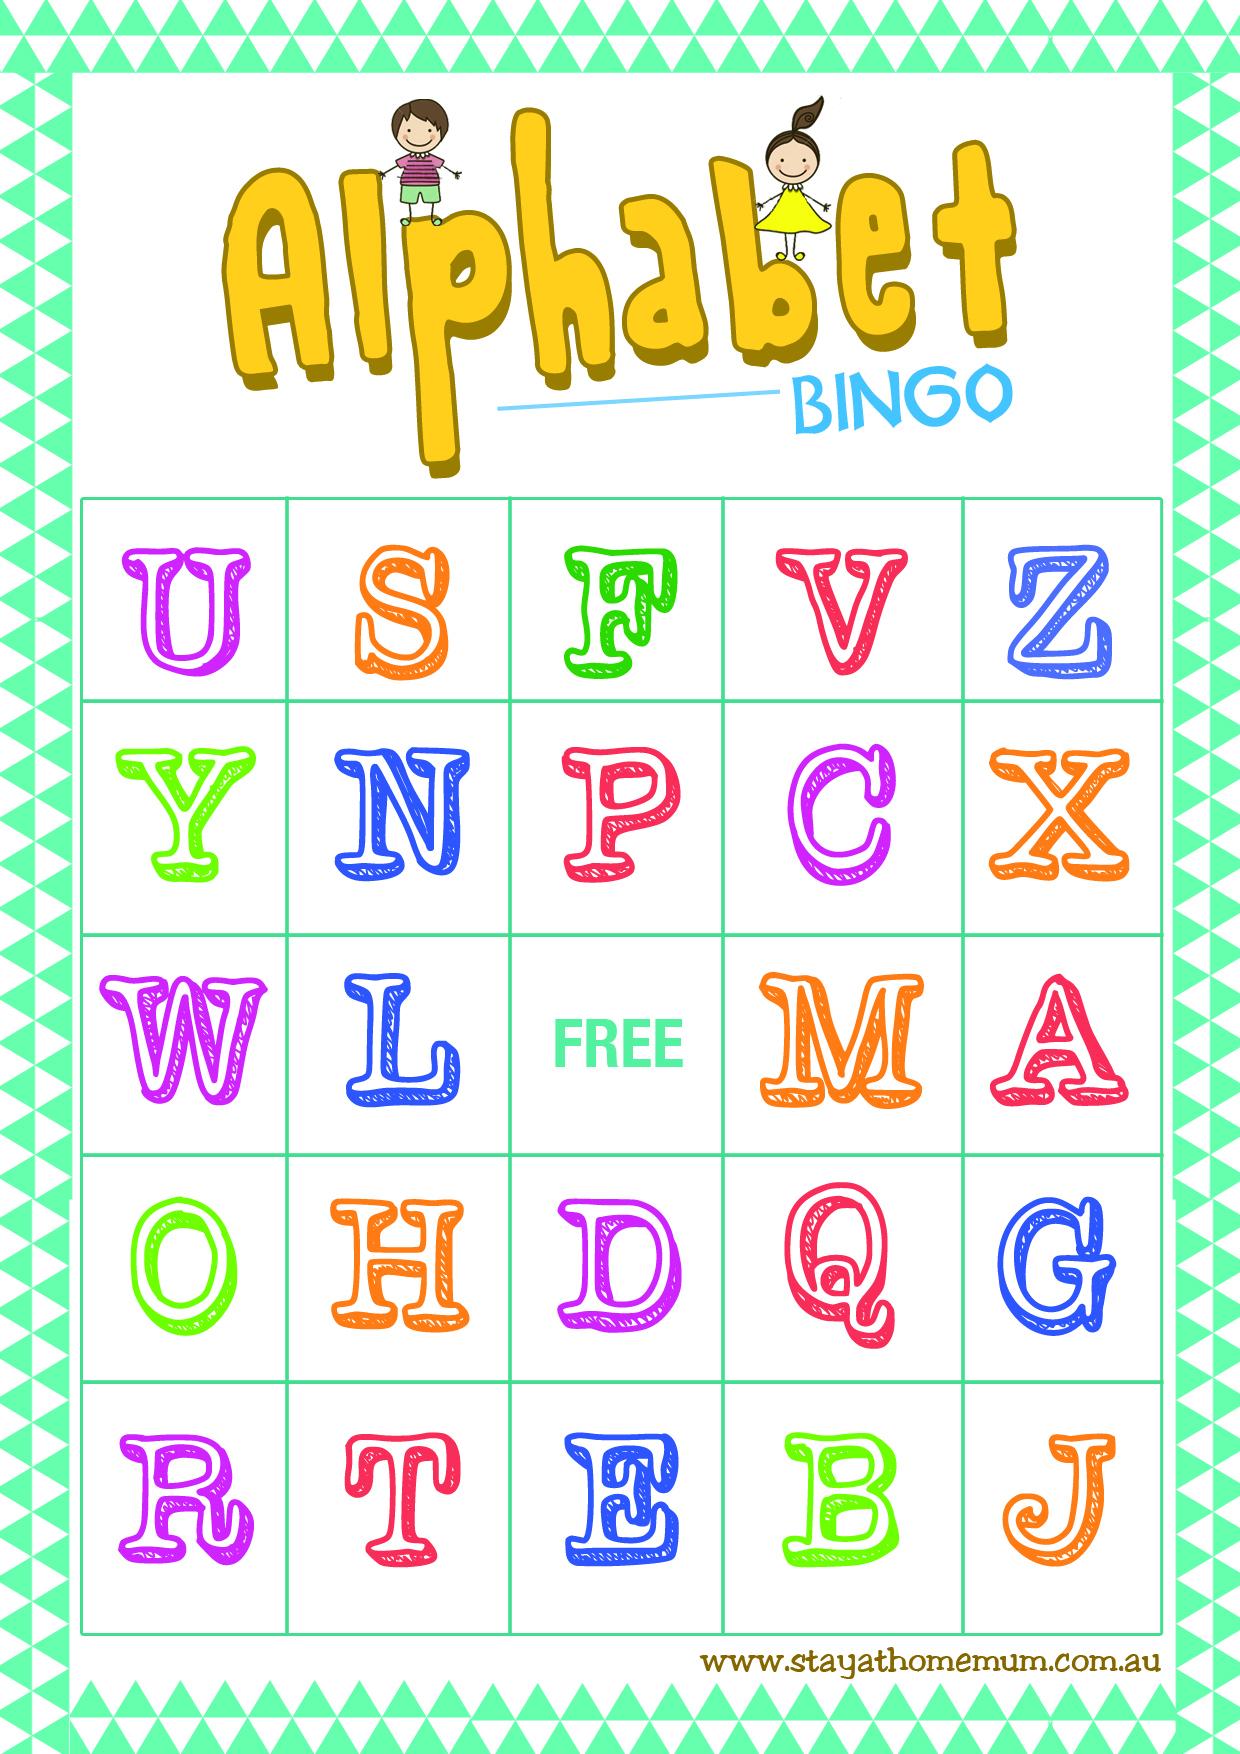 Alphabet Bingo Free Printable - Stay At Home Mum - Free Printable Alphabet Bingo Cards